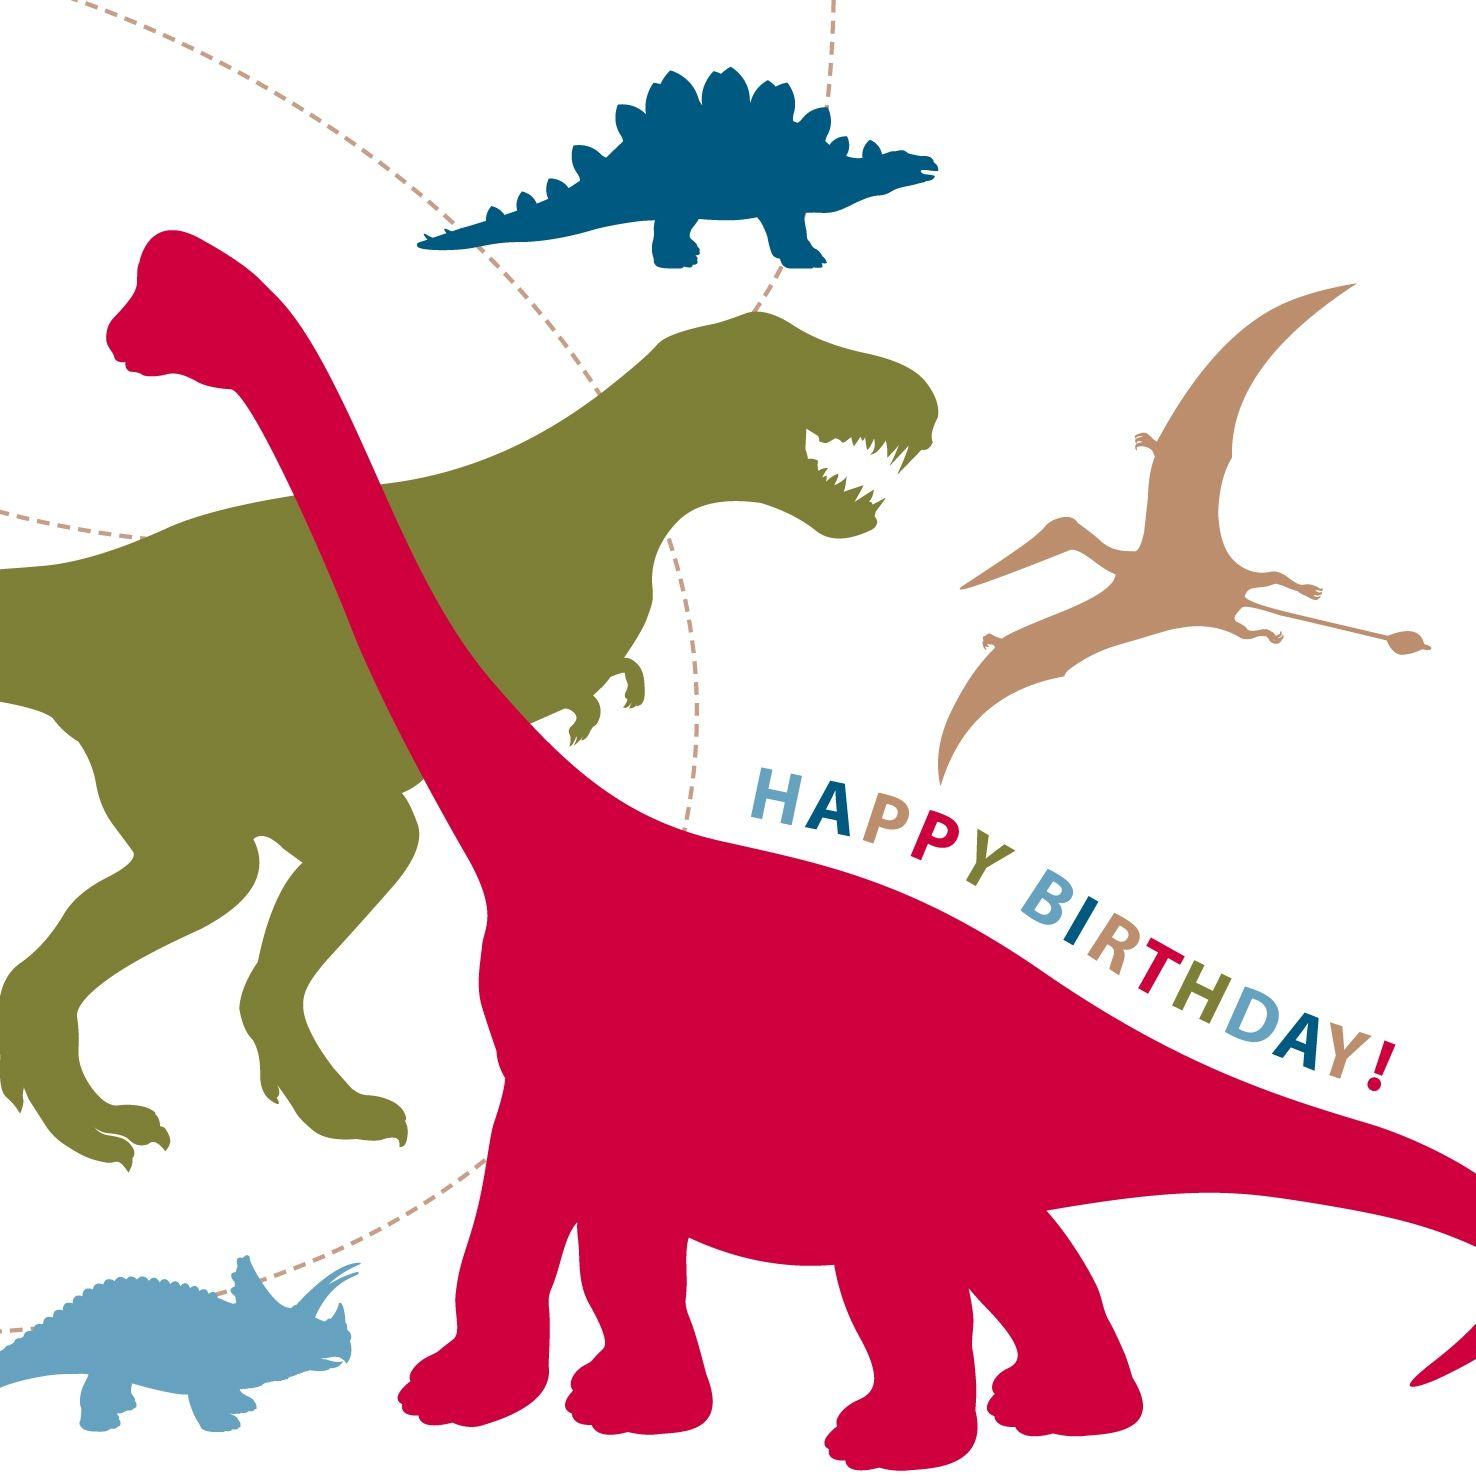 Dinosaur Birthday Card by Just Smitten | Birthday cards | Pinterest ...